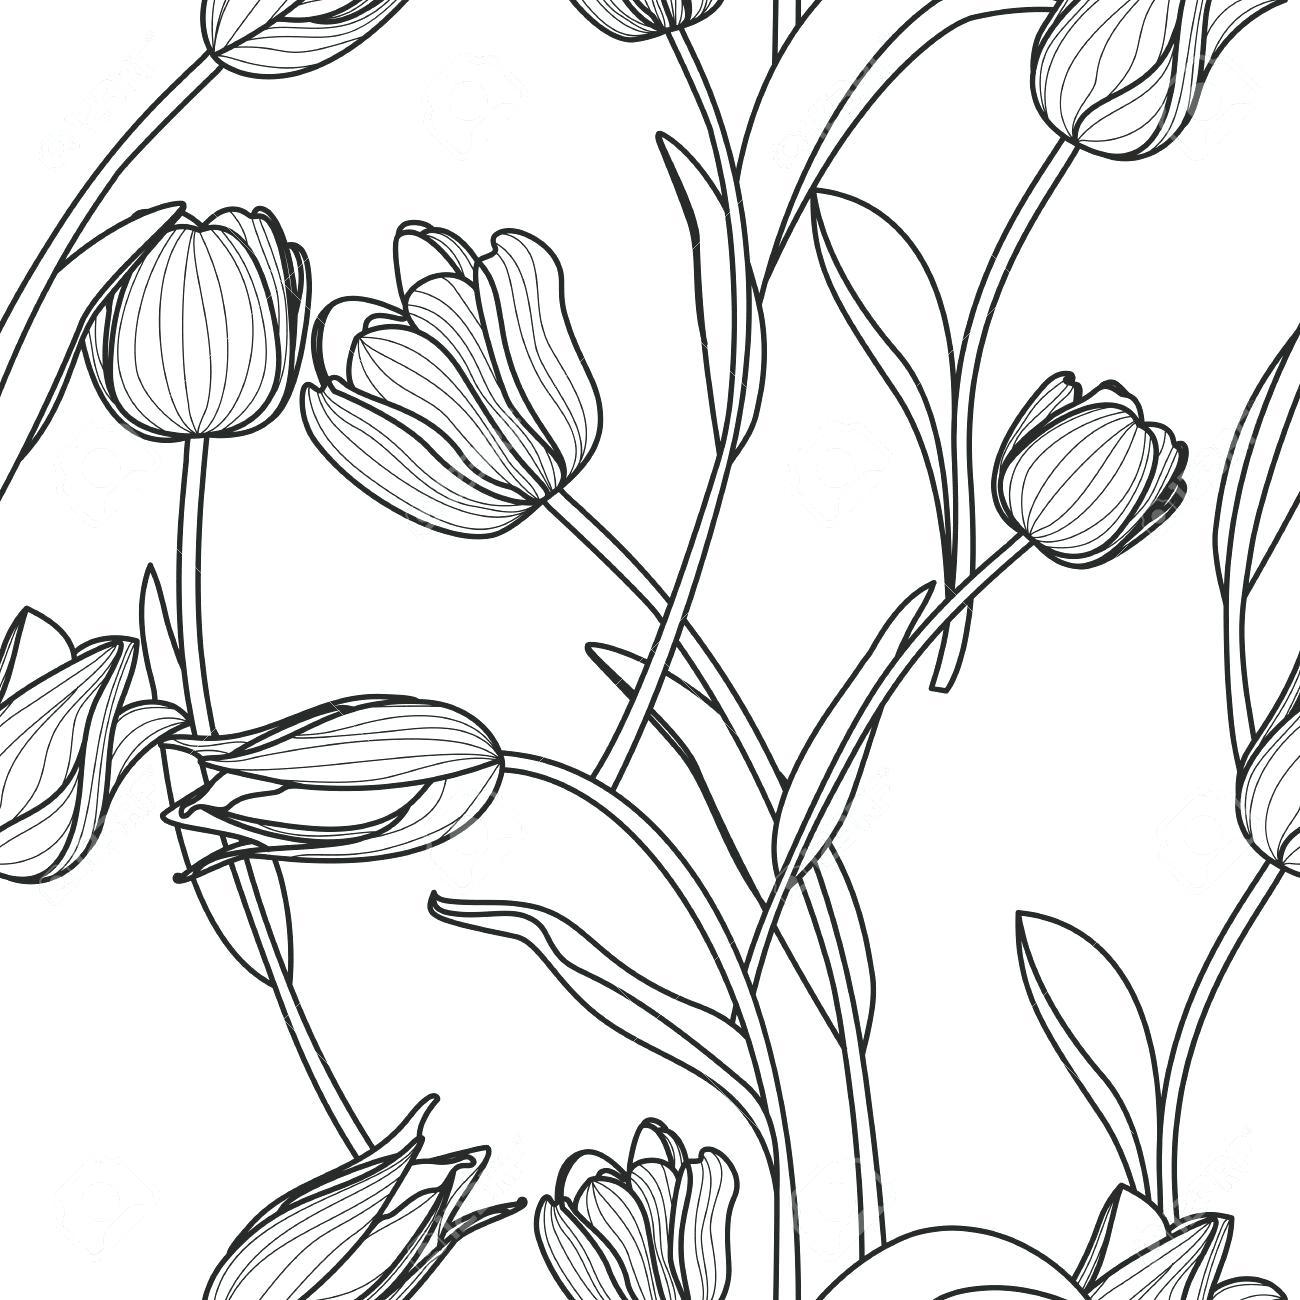 1300x1300 Rose Flower Outline Drawing Contour Stock Vector Lotus Clip Art